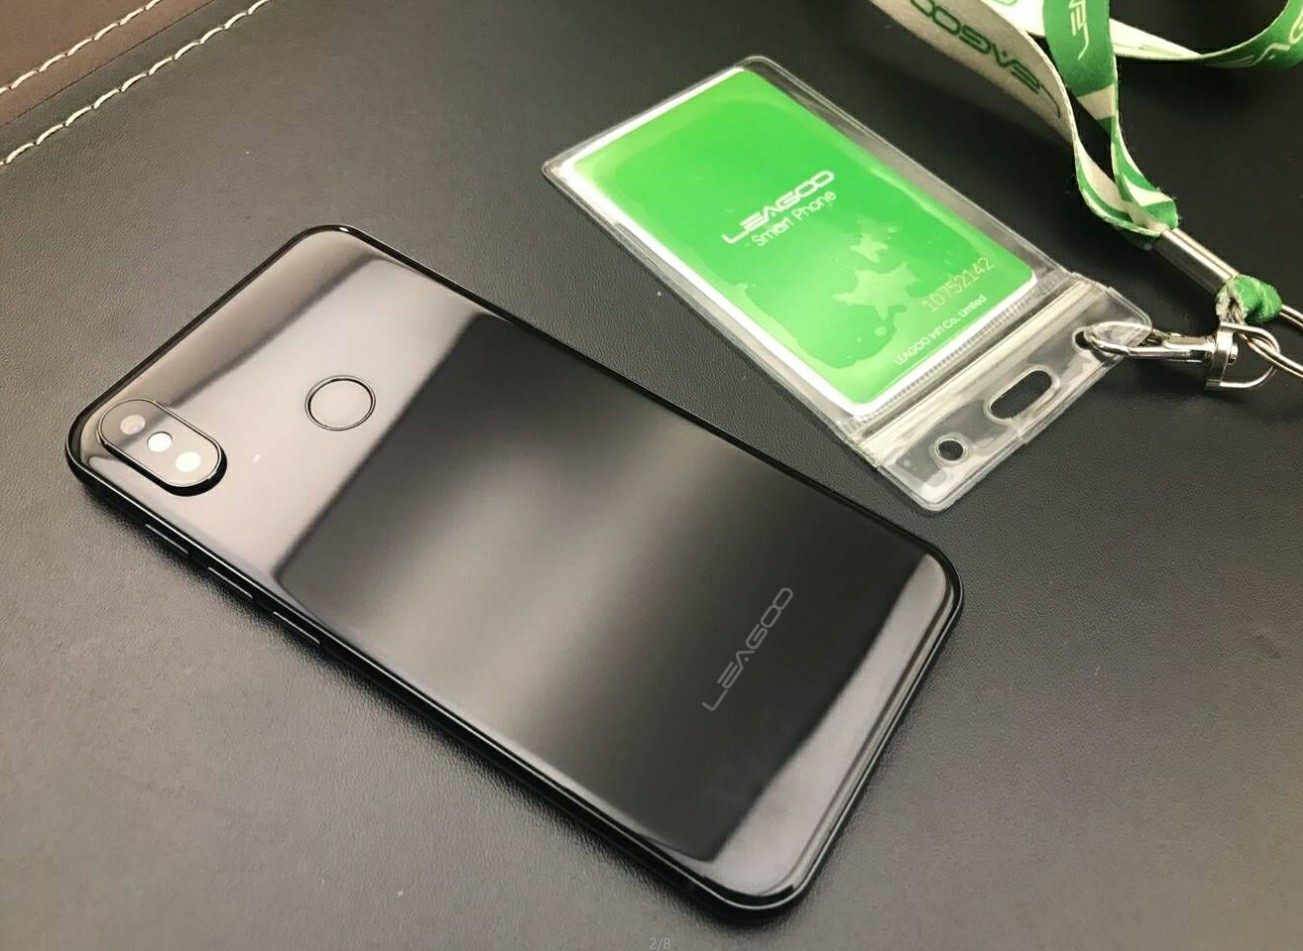 Leagoo S9 1